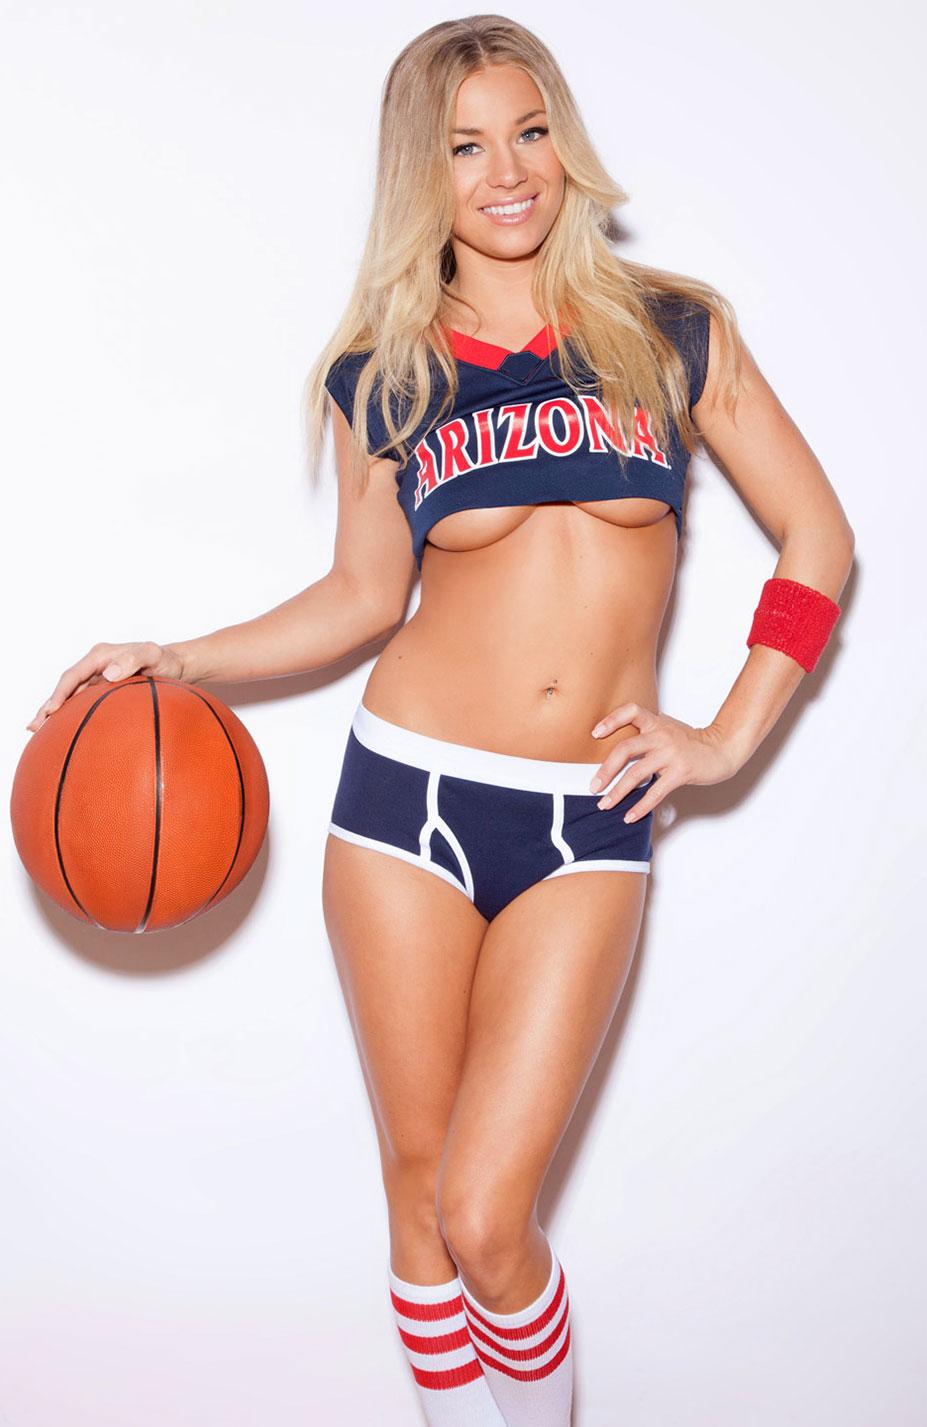 Никки Ли играет в баскетбол в форме команды Arizona Wildcats / Nikki Leigh - College Basketball